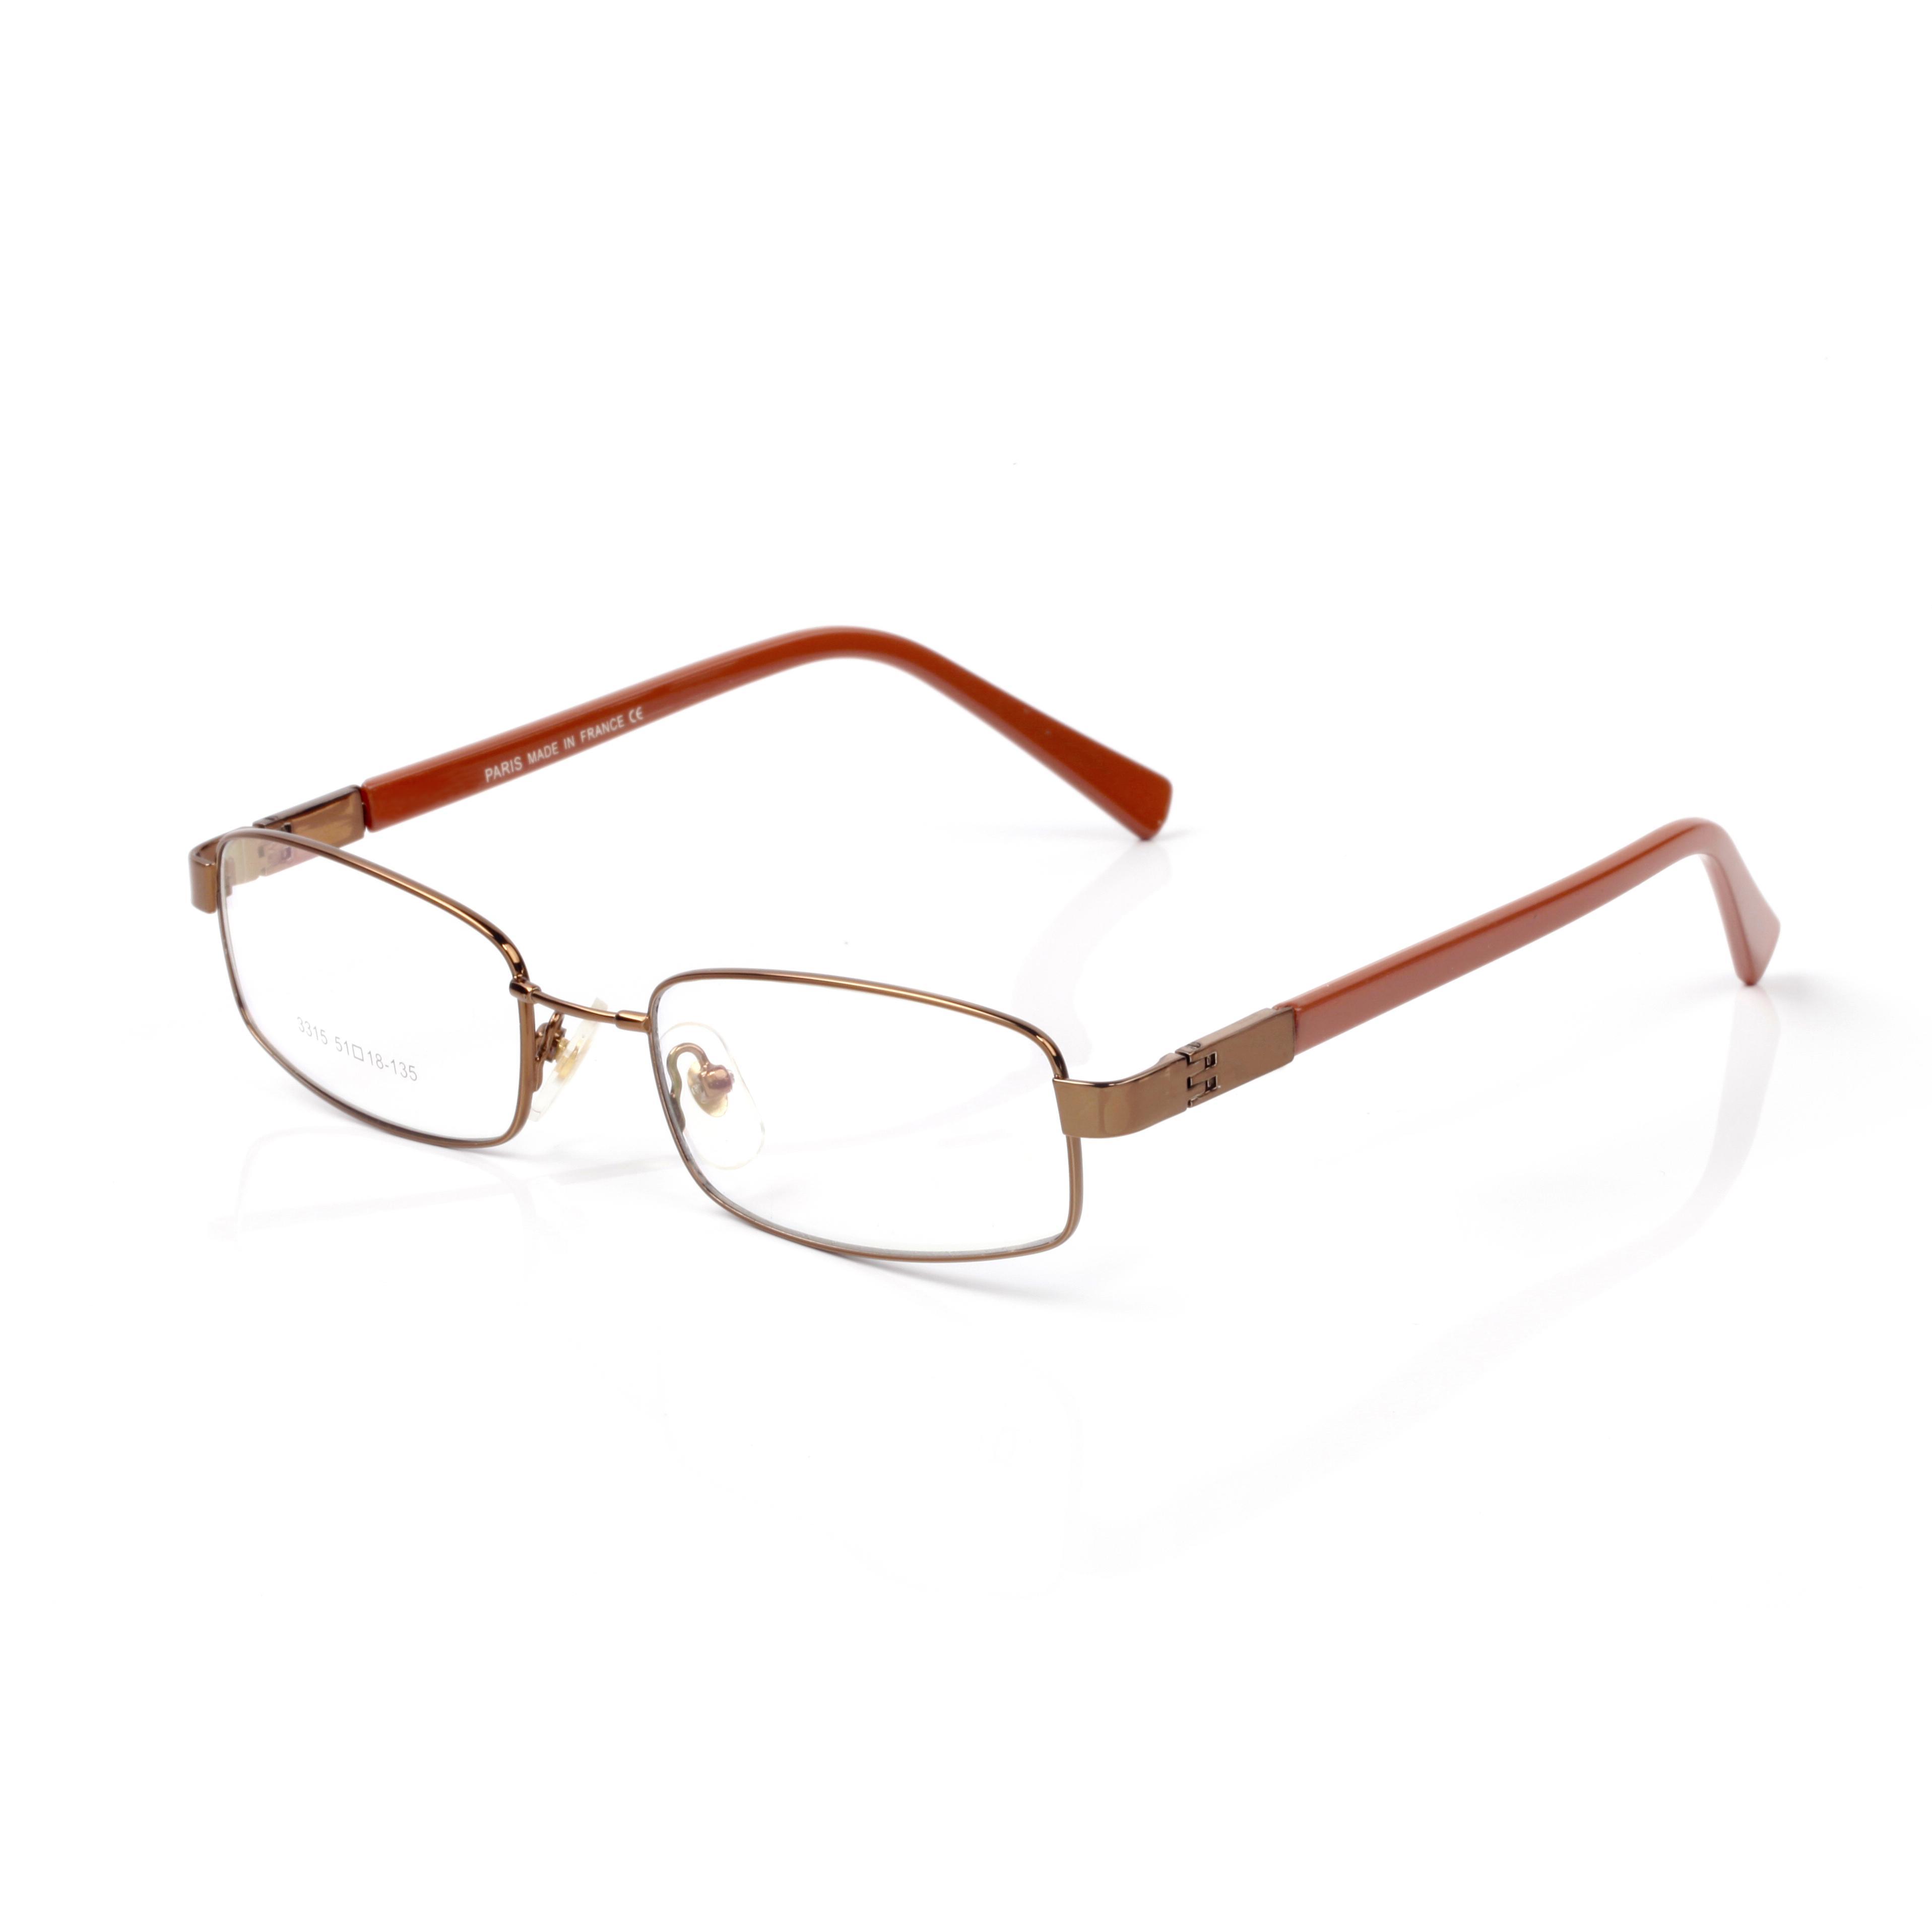 óculos de aros Designer Buffalo óculos de sol retro clássico Gradiente Feminino Sunglass Homens Vintage Sun Óculos armações mulheres luxo de